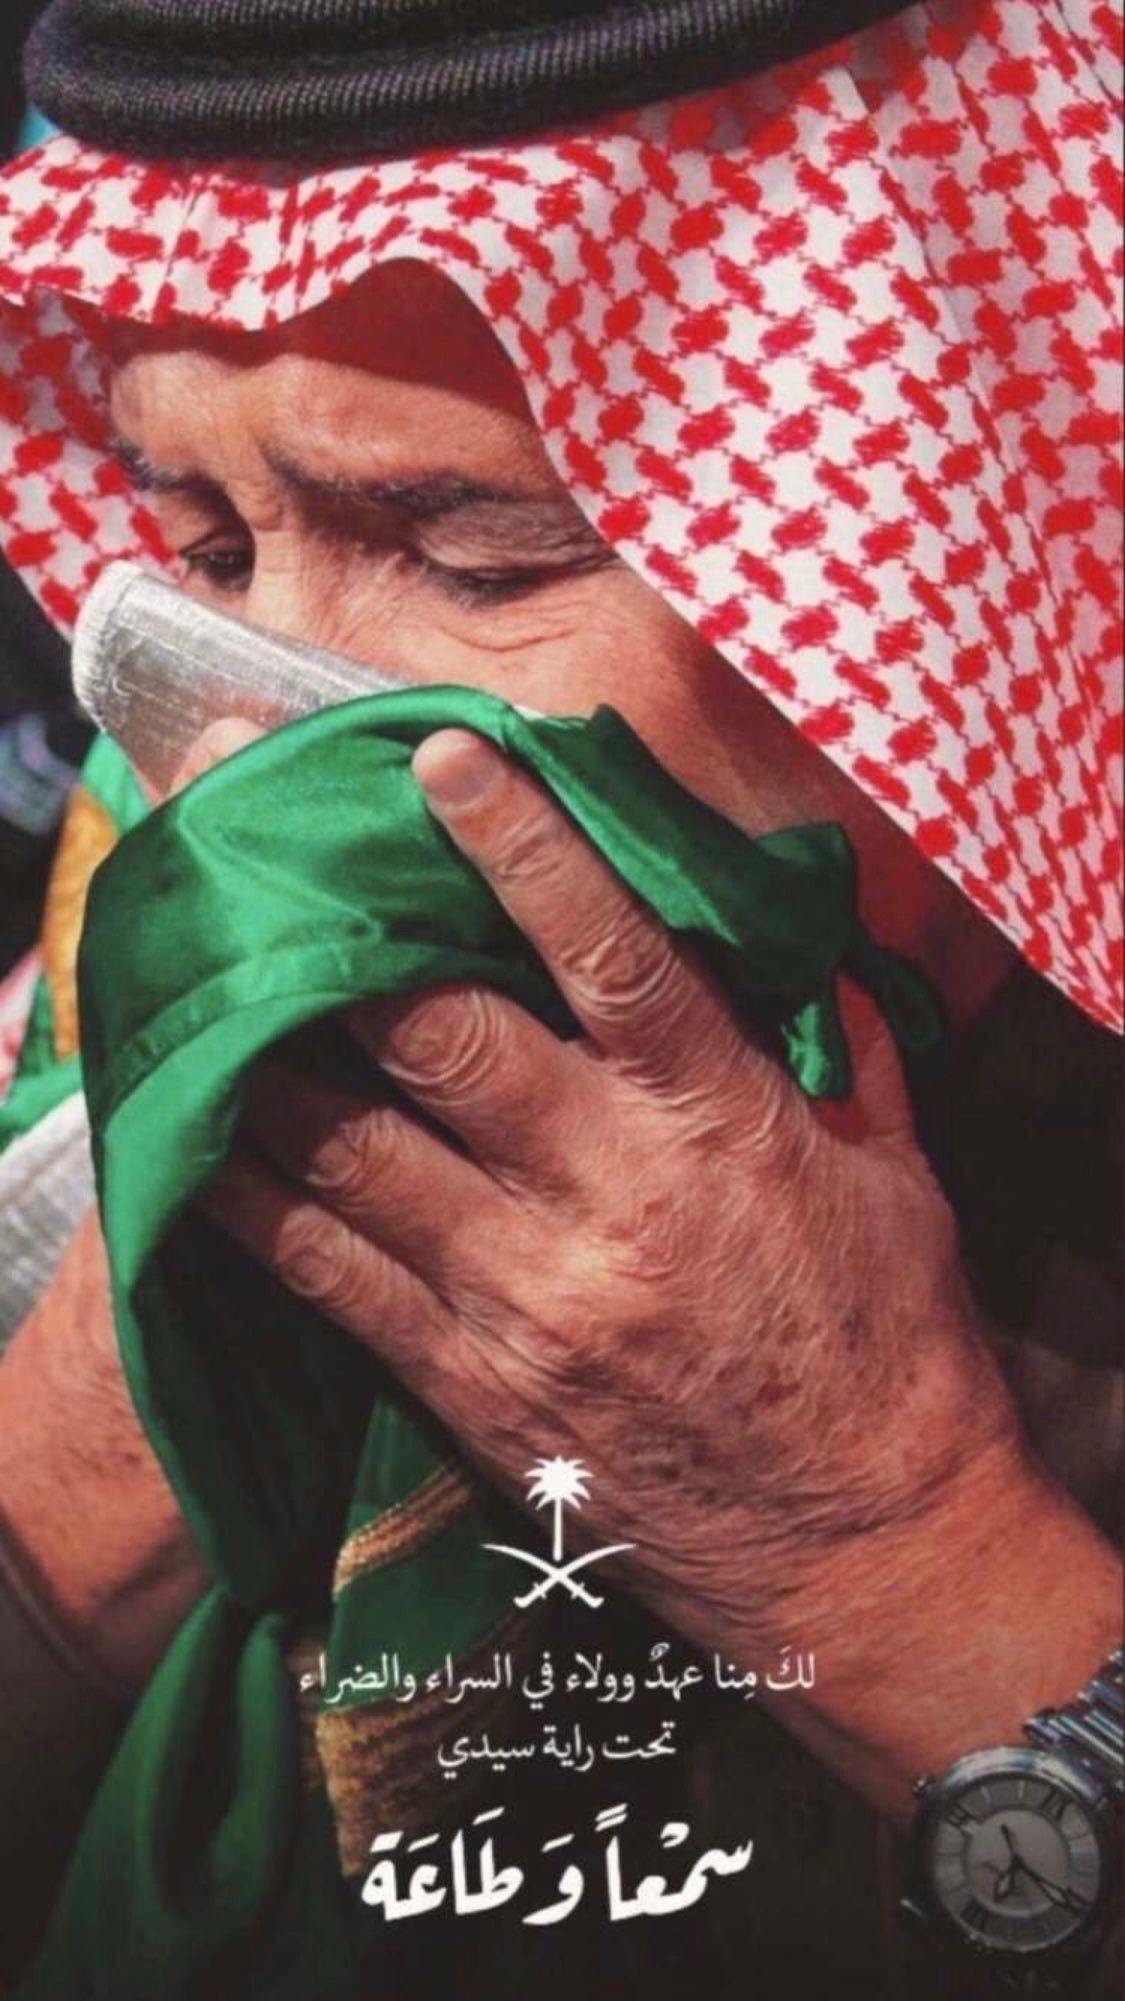 Pin By Shuaa Alhussaini On دام عزك ياوطن Ksa Saudi Arabia Saudi Arabia Flag National Day Saudi